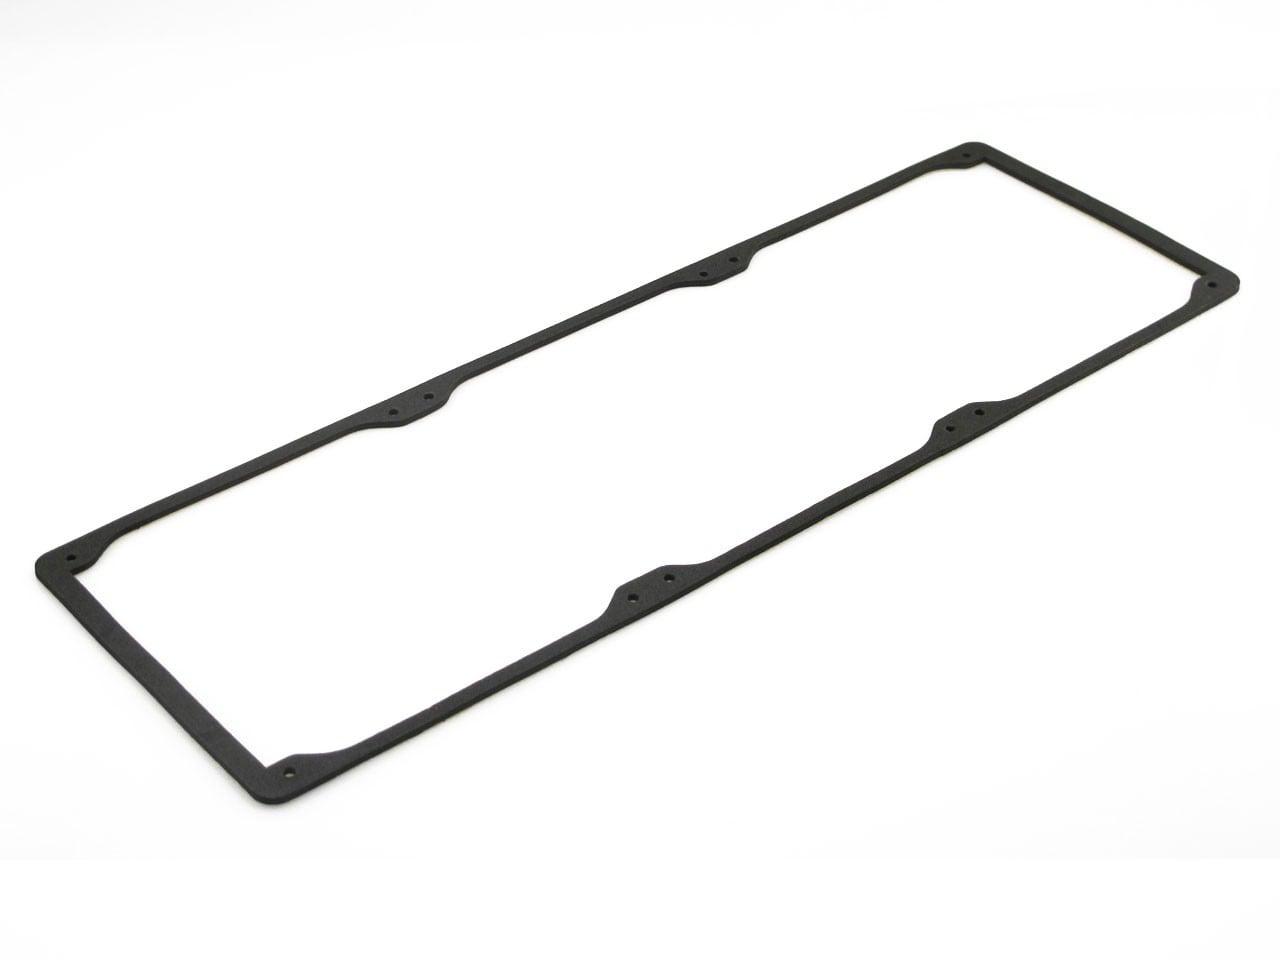 420mm Triple Radiator Gasket (3mm thickness)